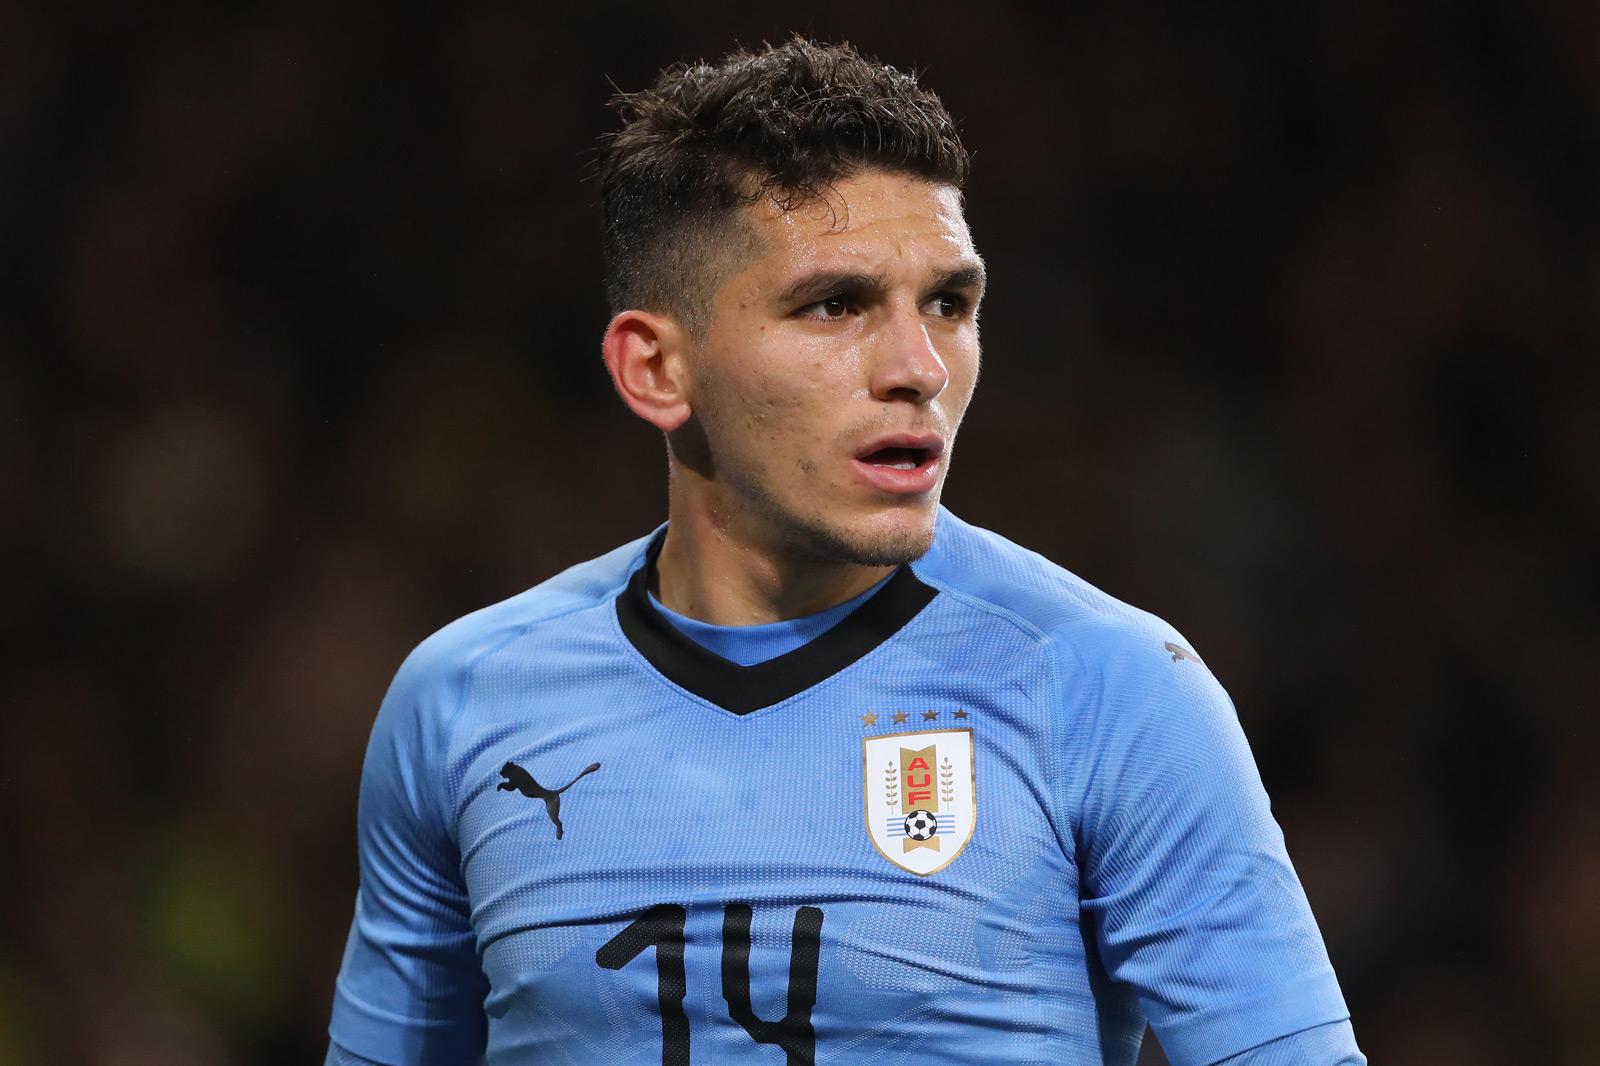 Nationalspieler Mustafi